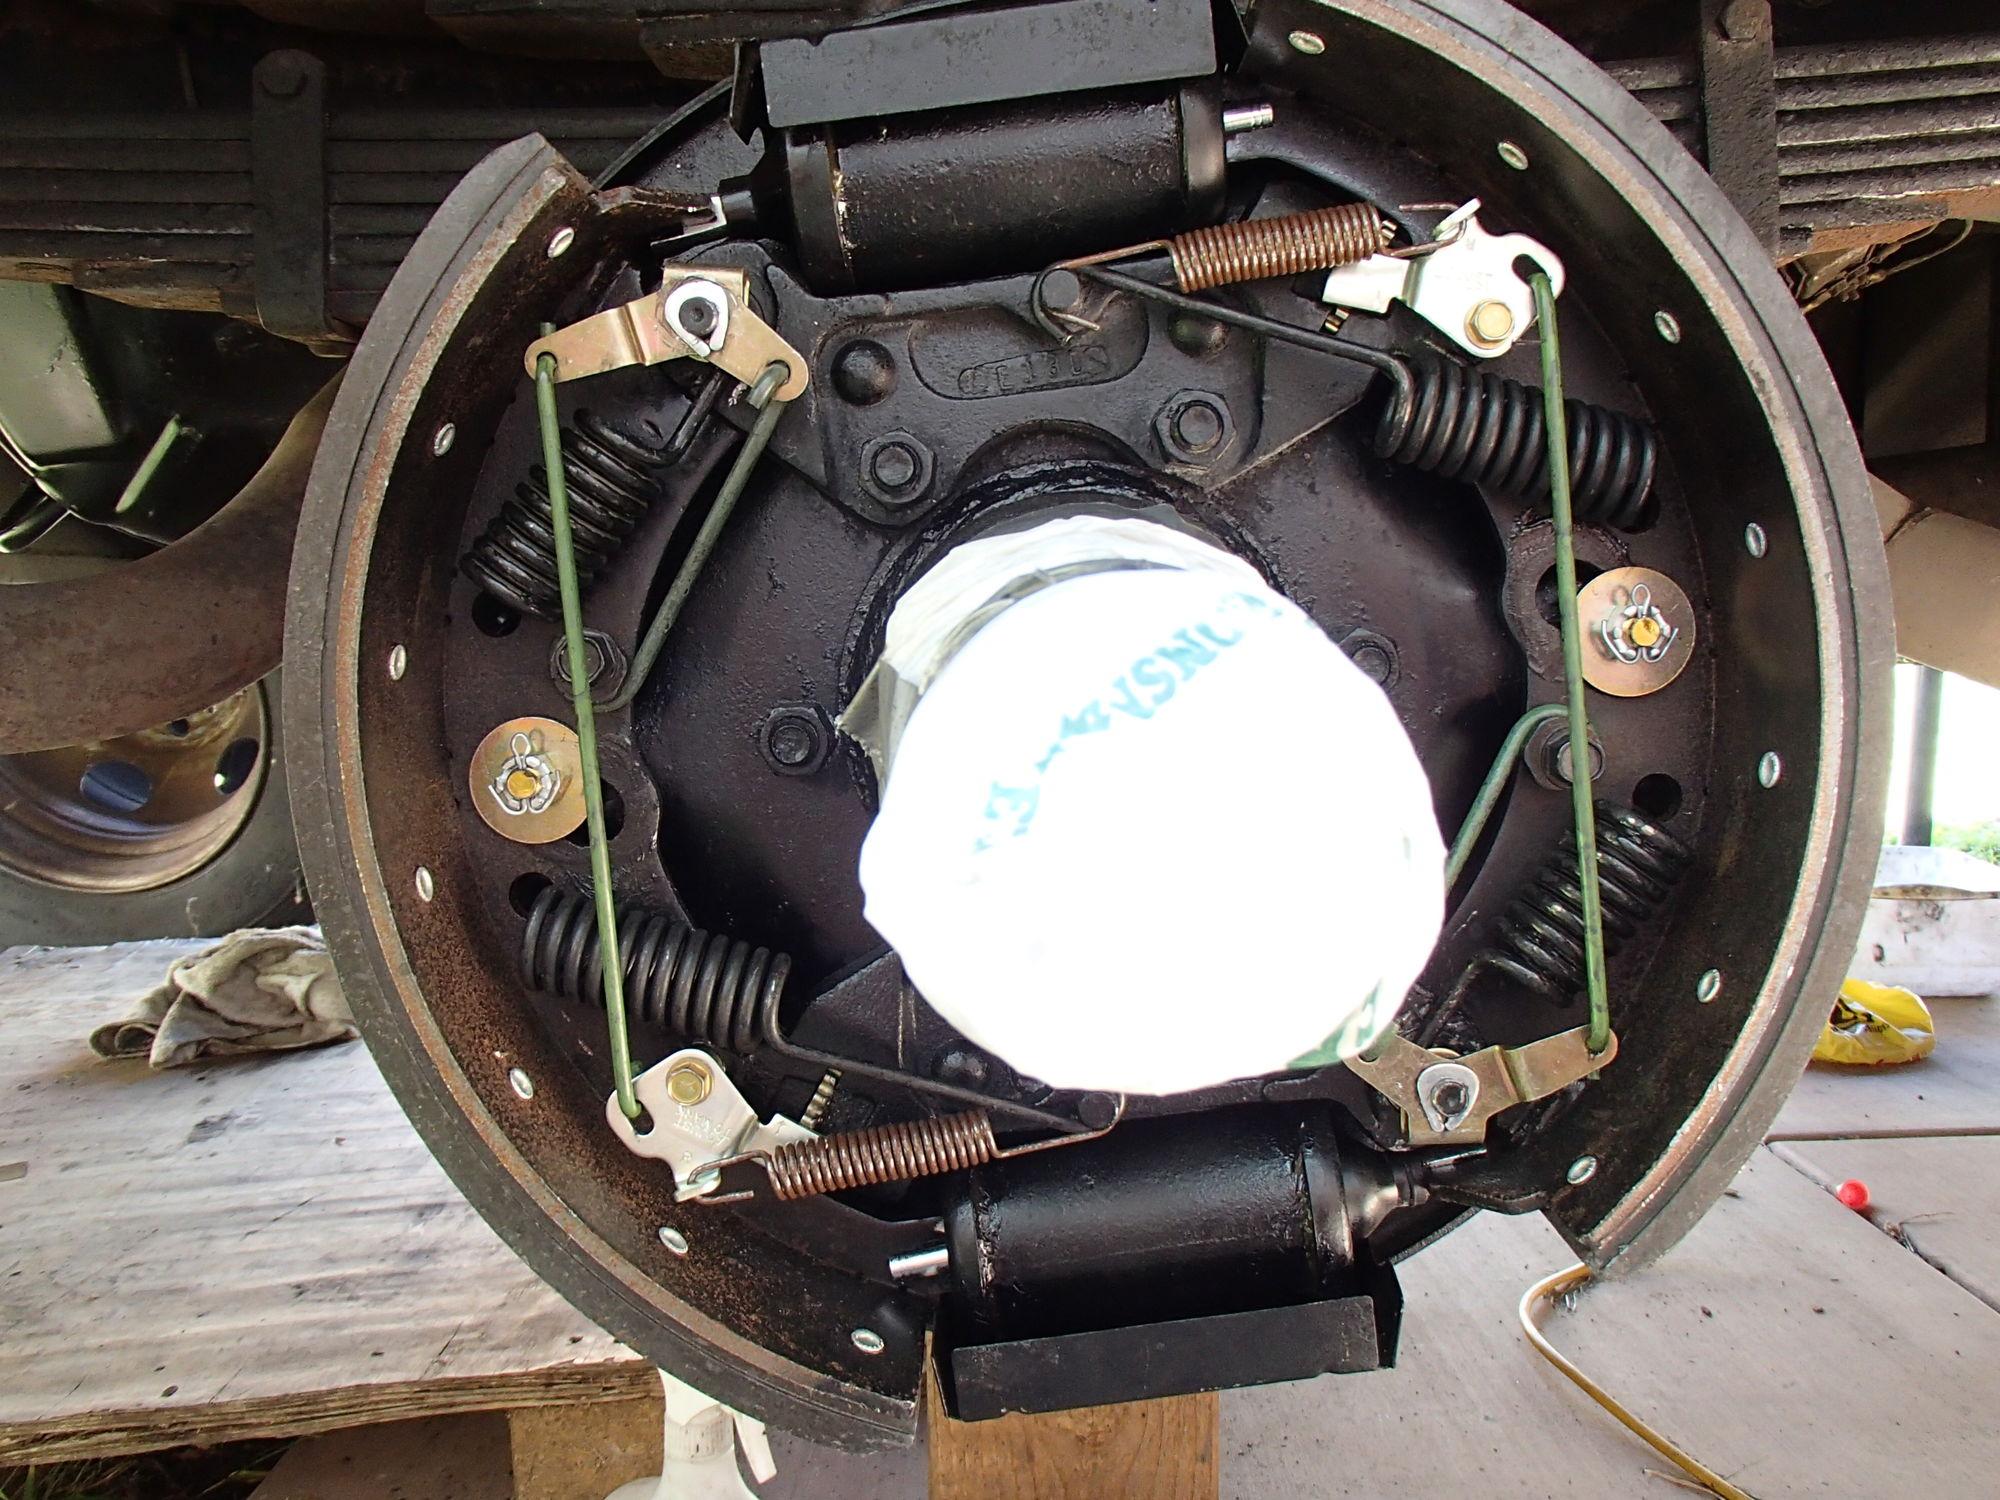 Ford Truck Brake System : G f hydrovac brake question self